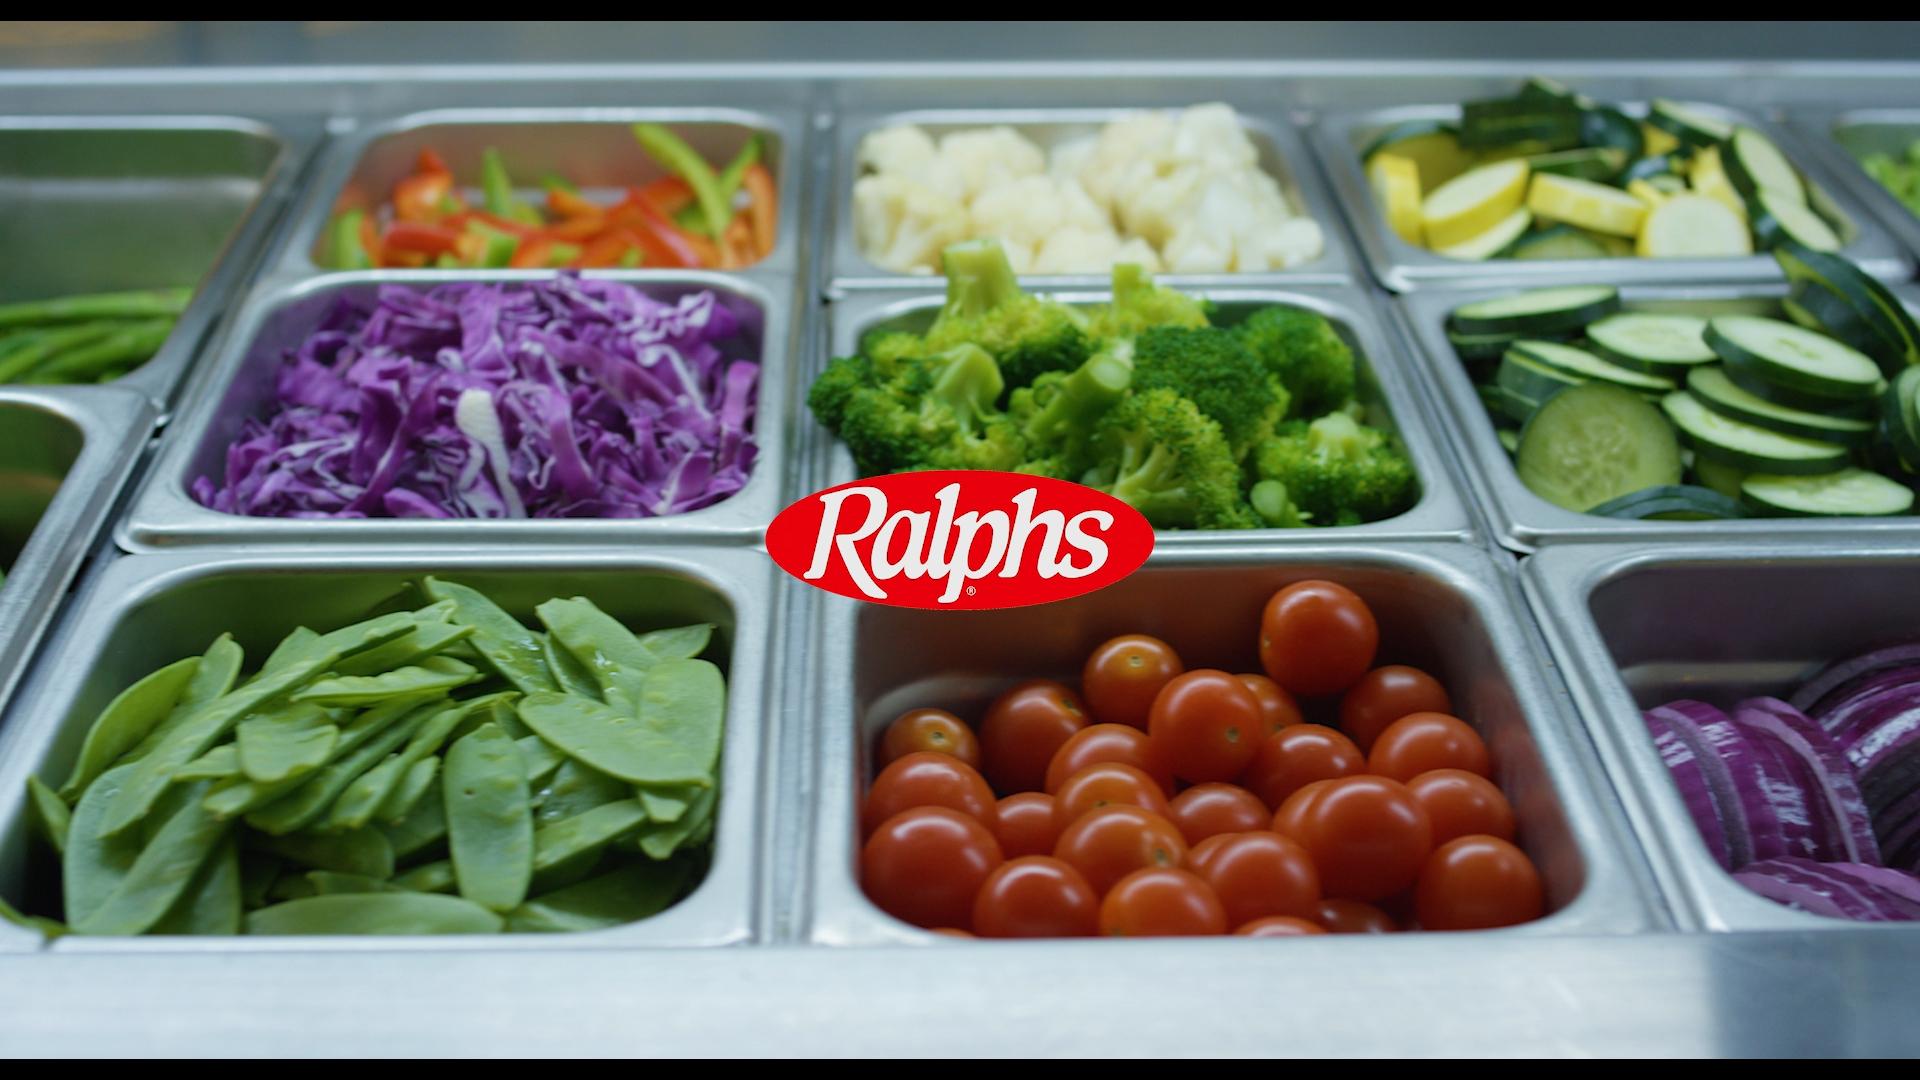 Ralphs_1.1.1.jpg